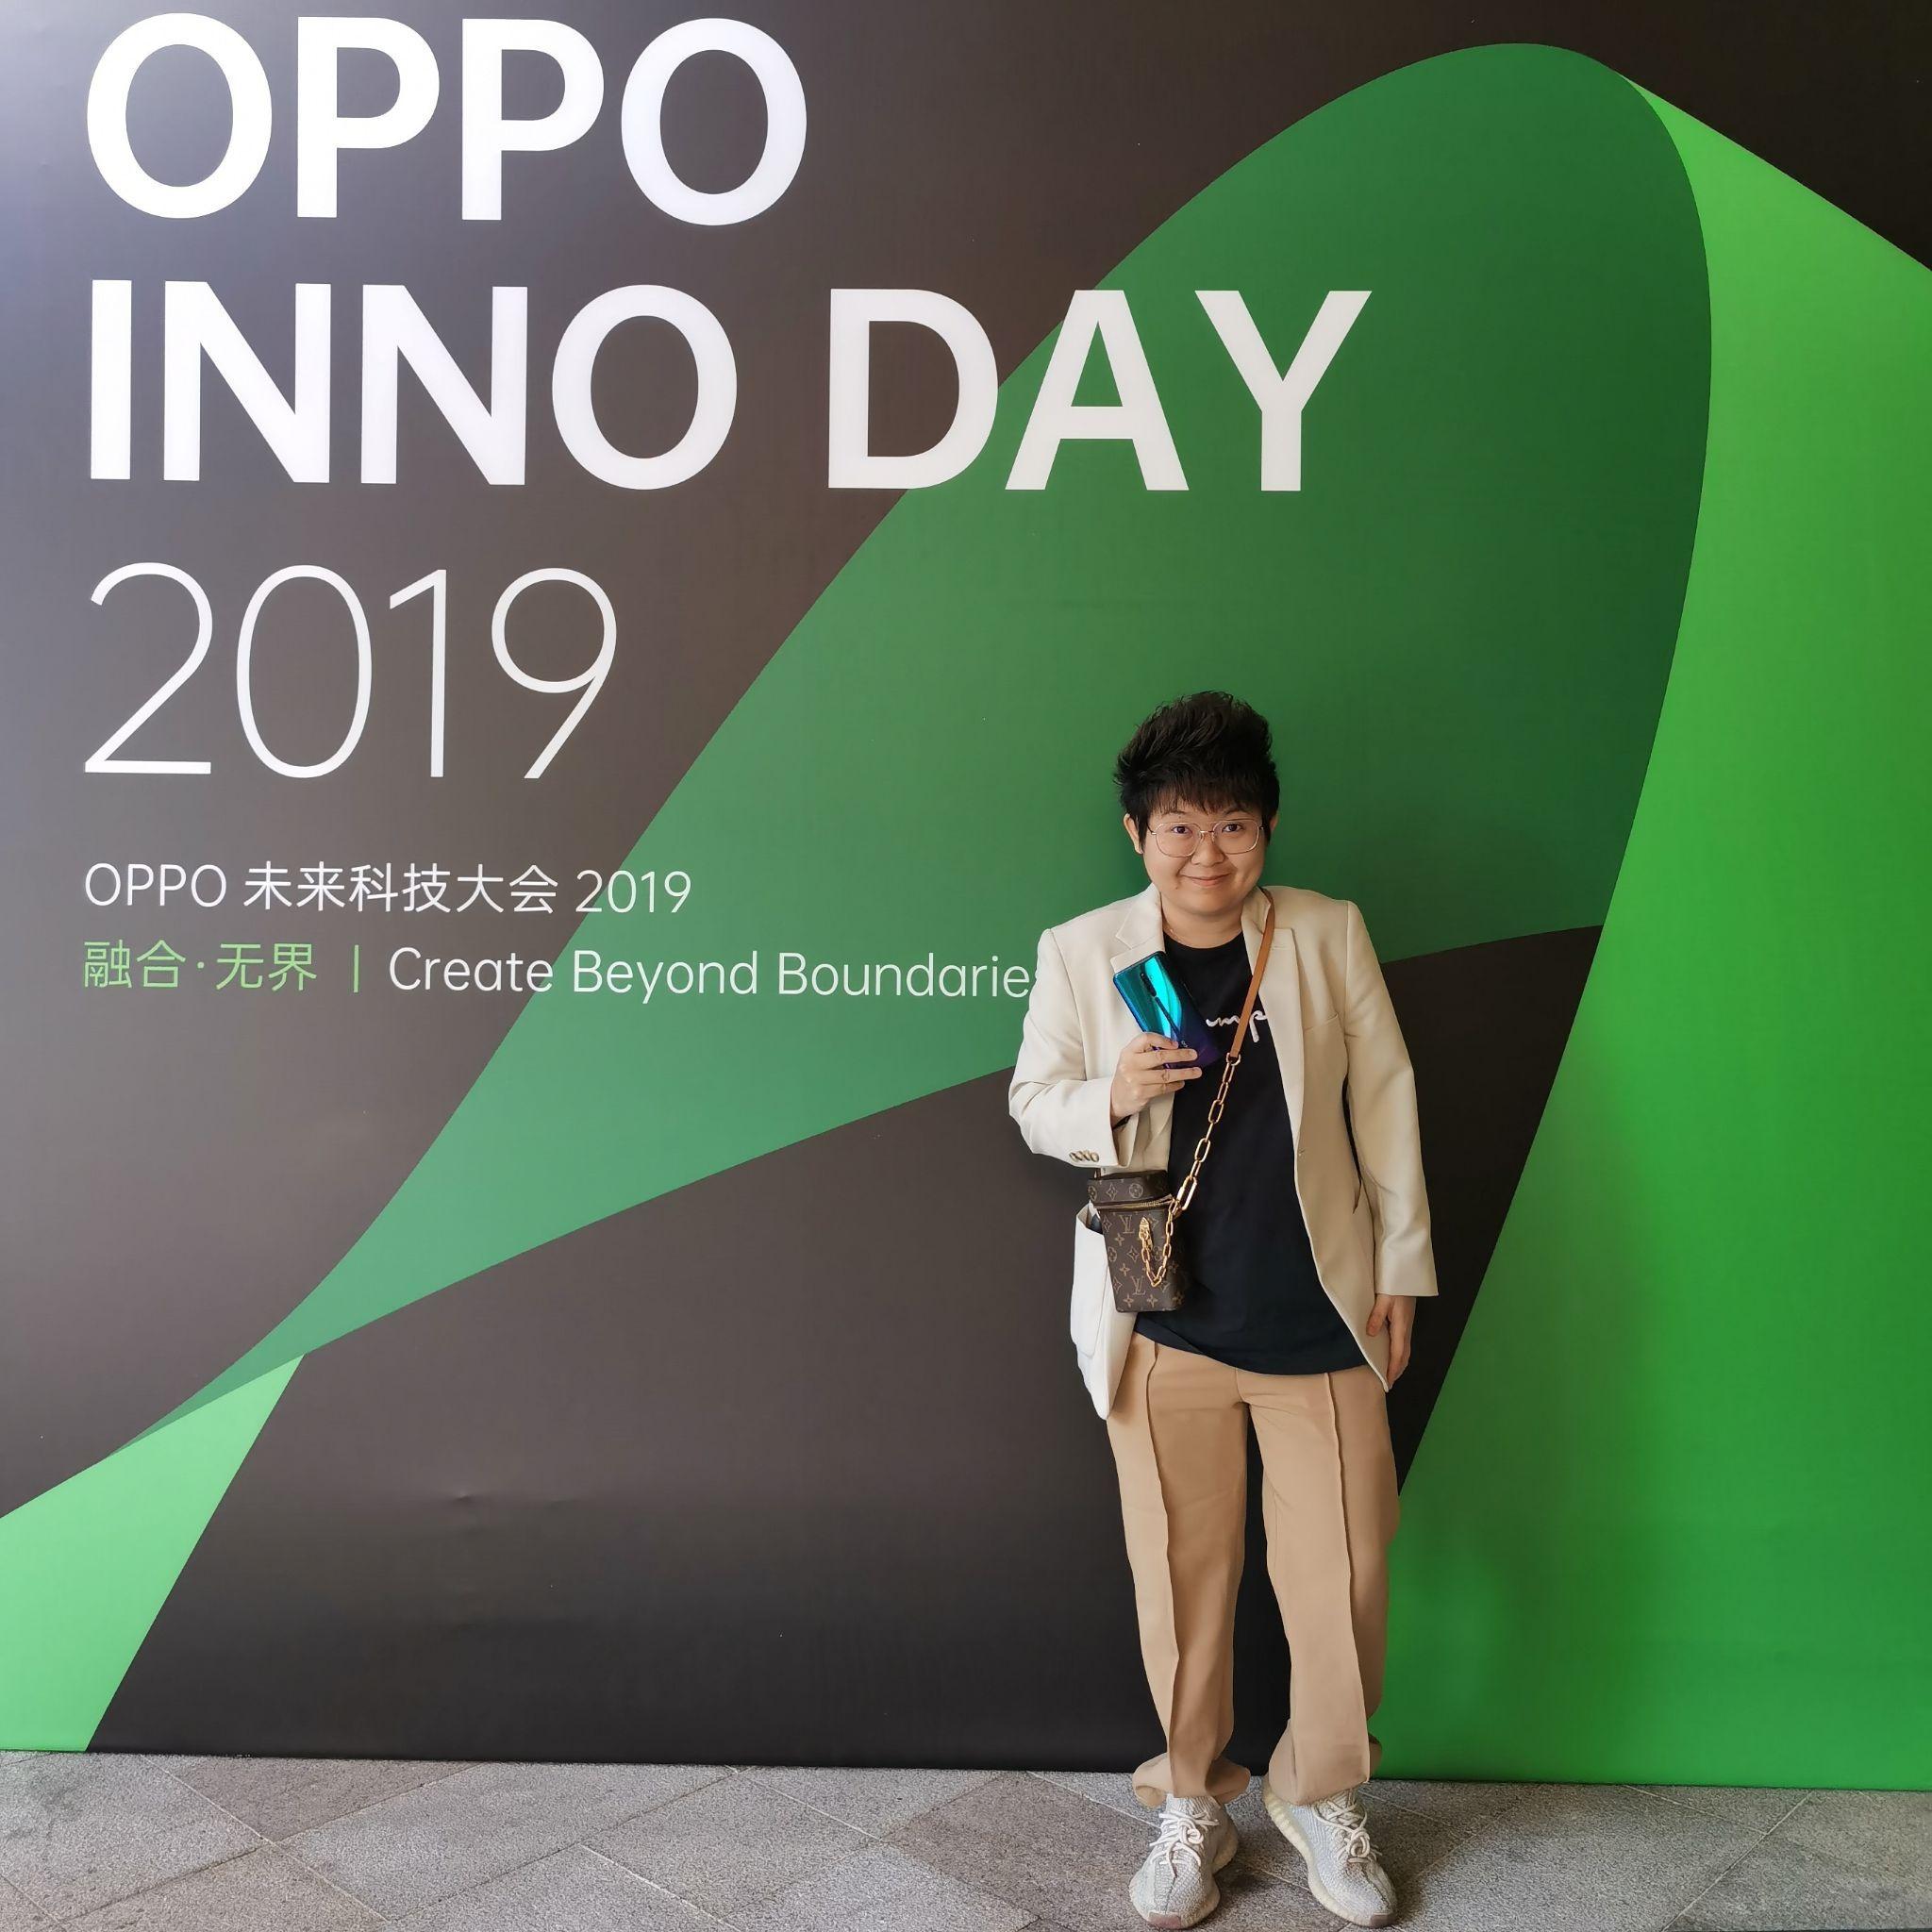 OPPO INNO DAY 2019